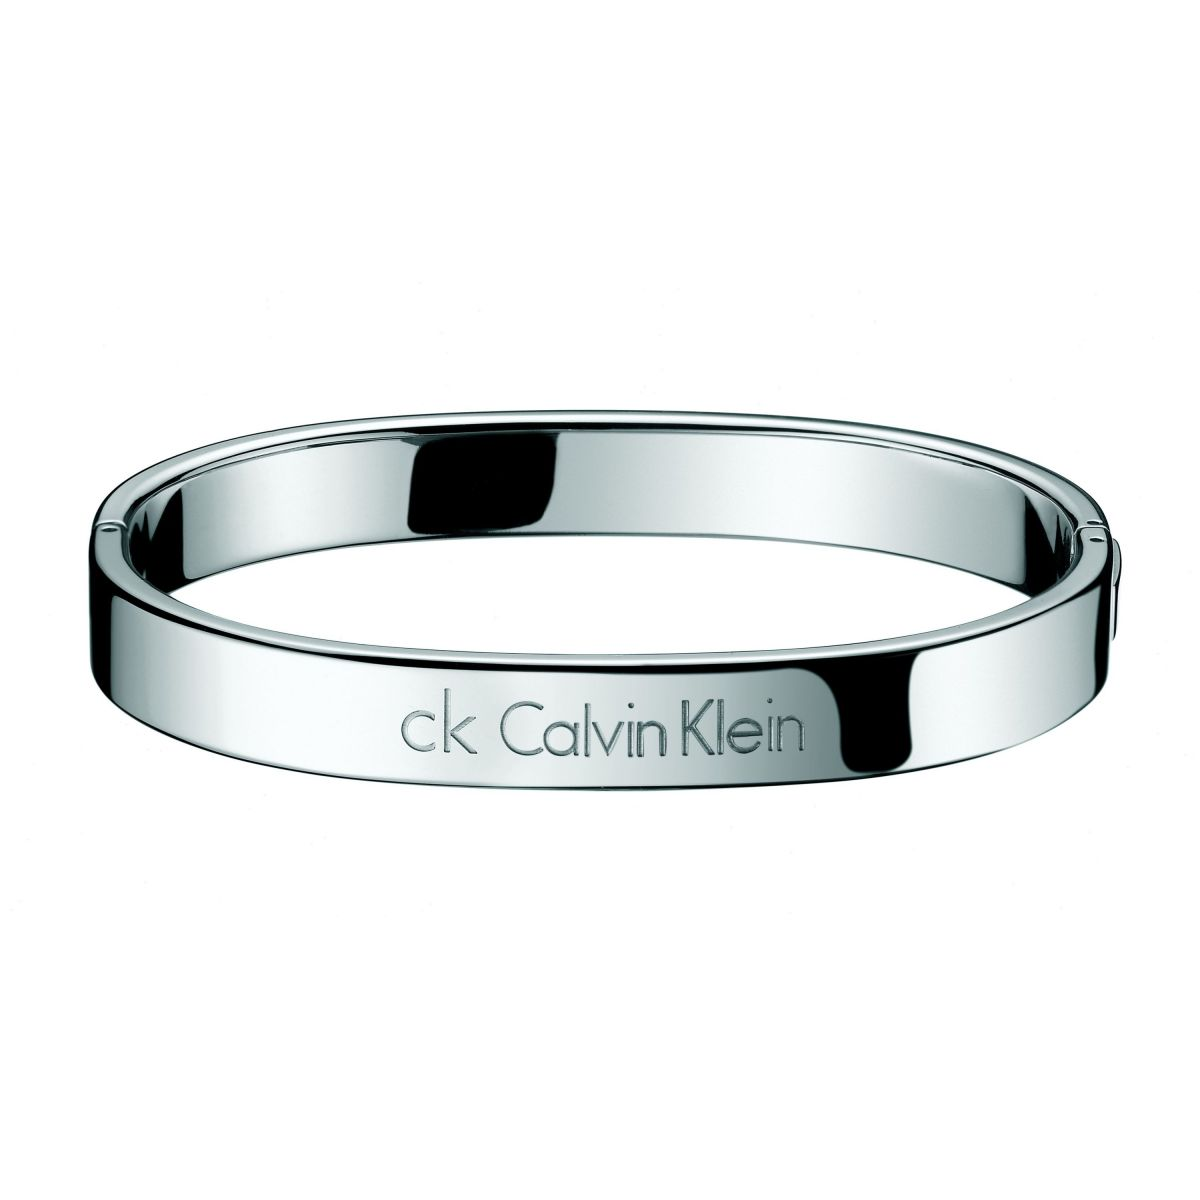 femme Calvin Klein Jewellery Hook Bangle Watch KJ06CB01010S